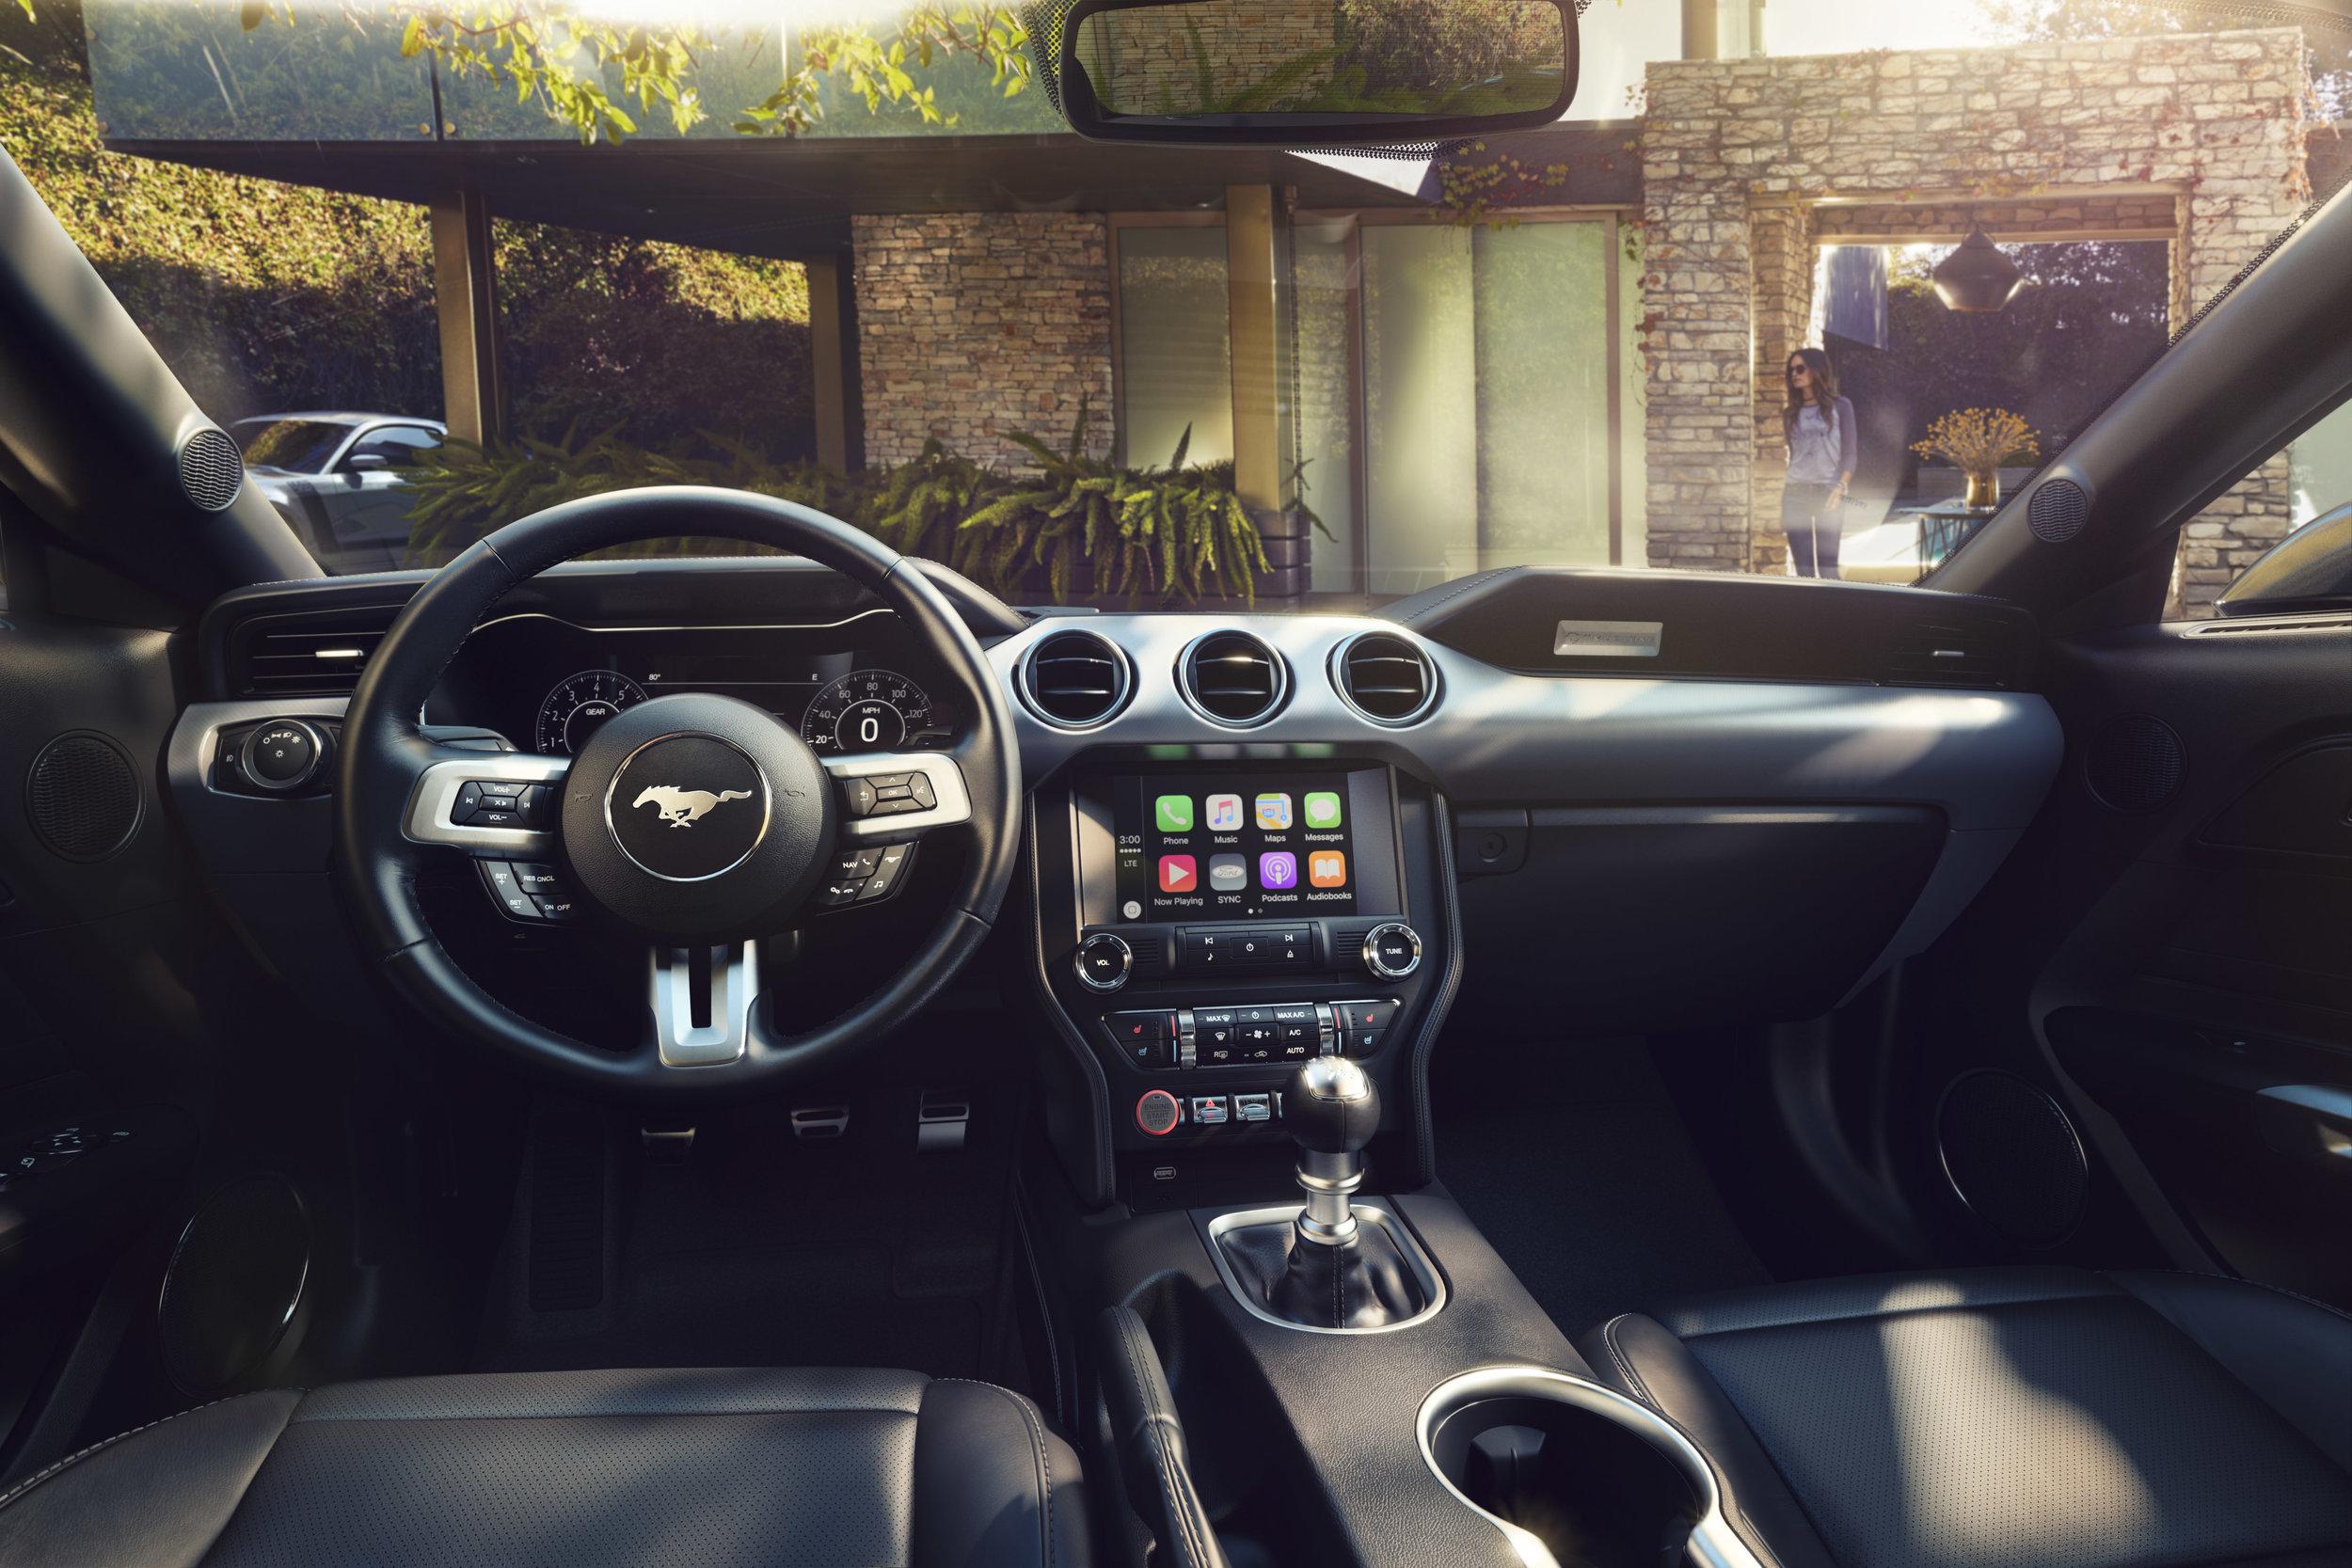 New-Ford-Mustang-Interior 1.jpg